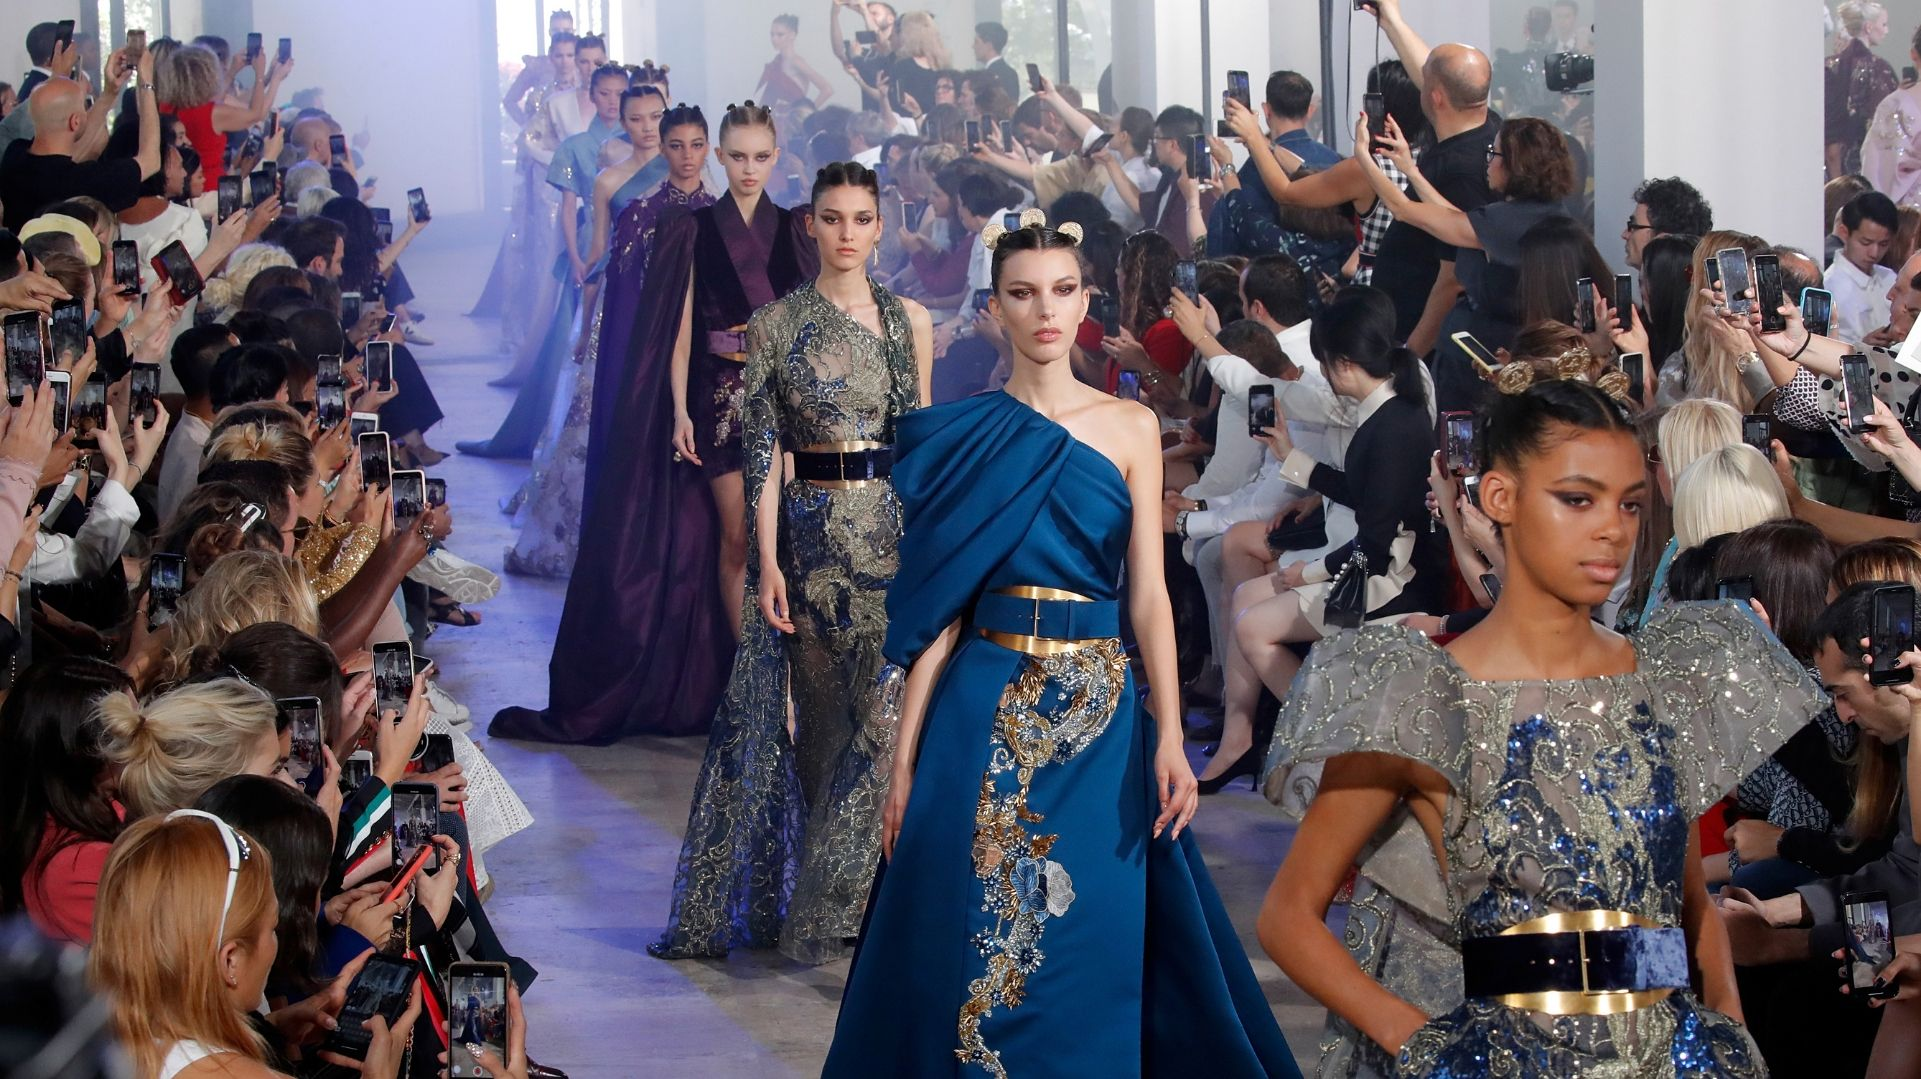 Paris Haute Couture Fashion Week 2019 stuns with extraordinary fashion craftsmanship - Firstpost